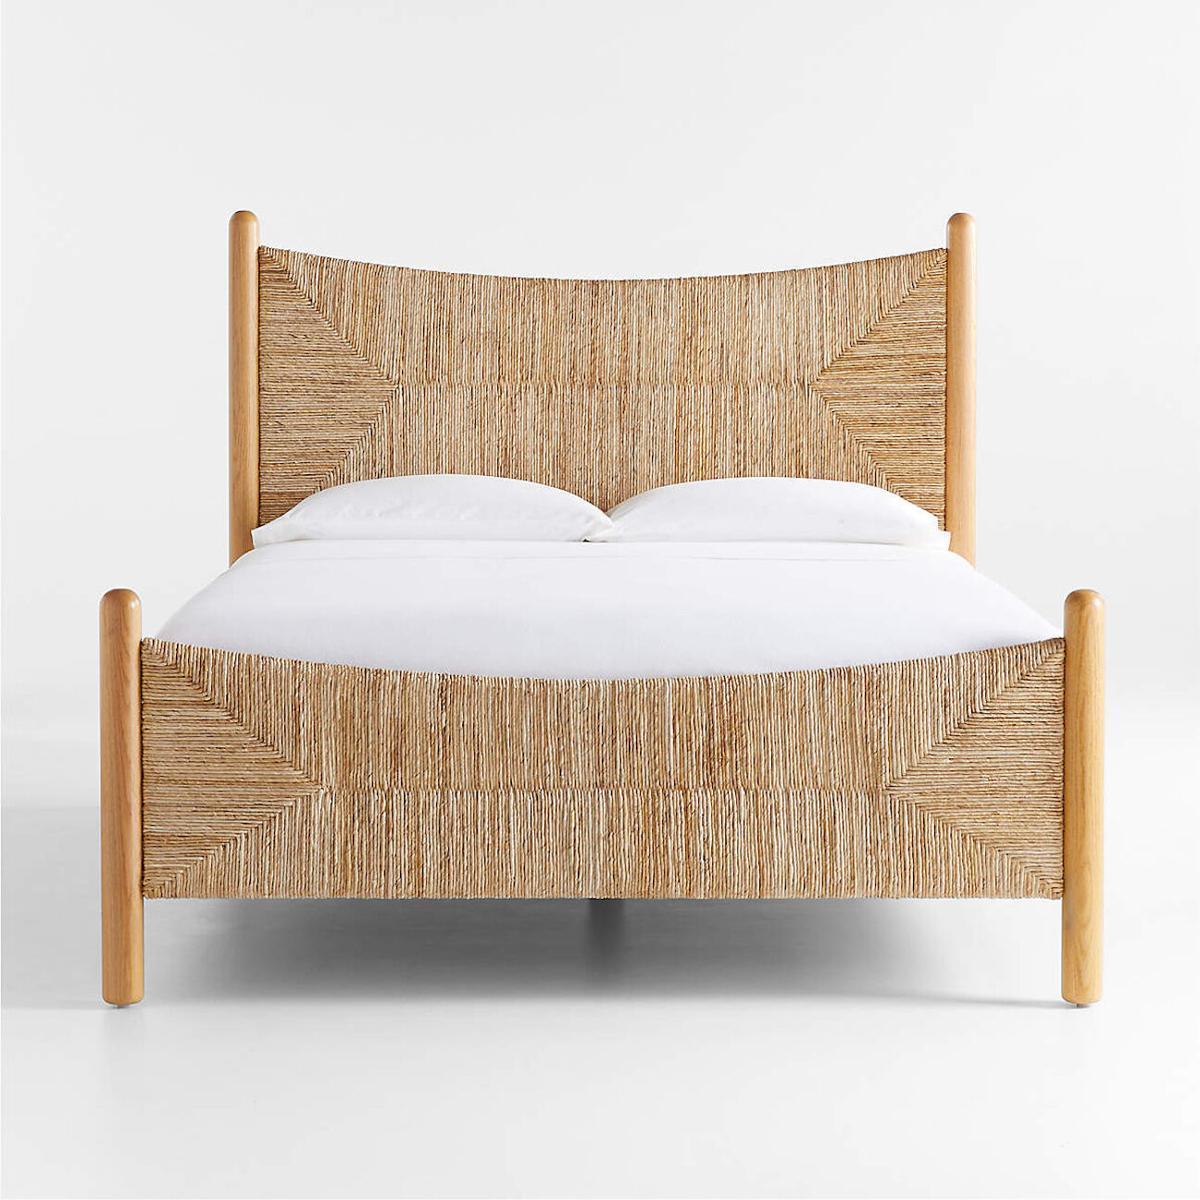 COOL NATURAL  crate and barrel bed - Copy.jpg